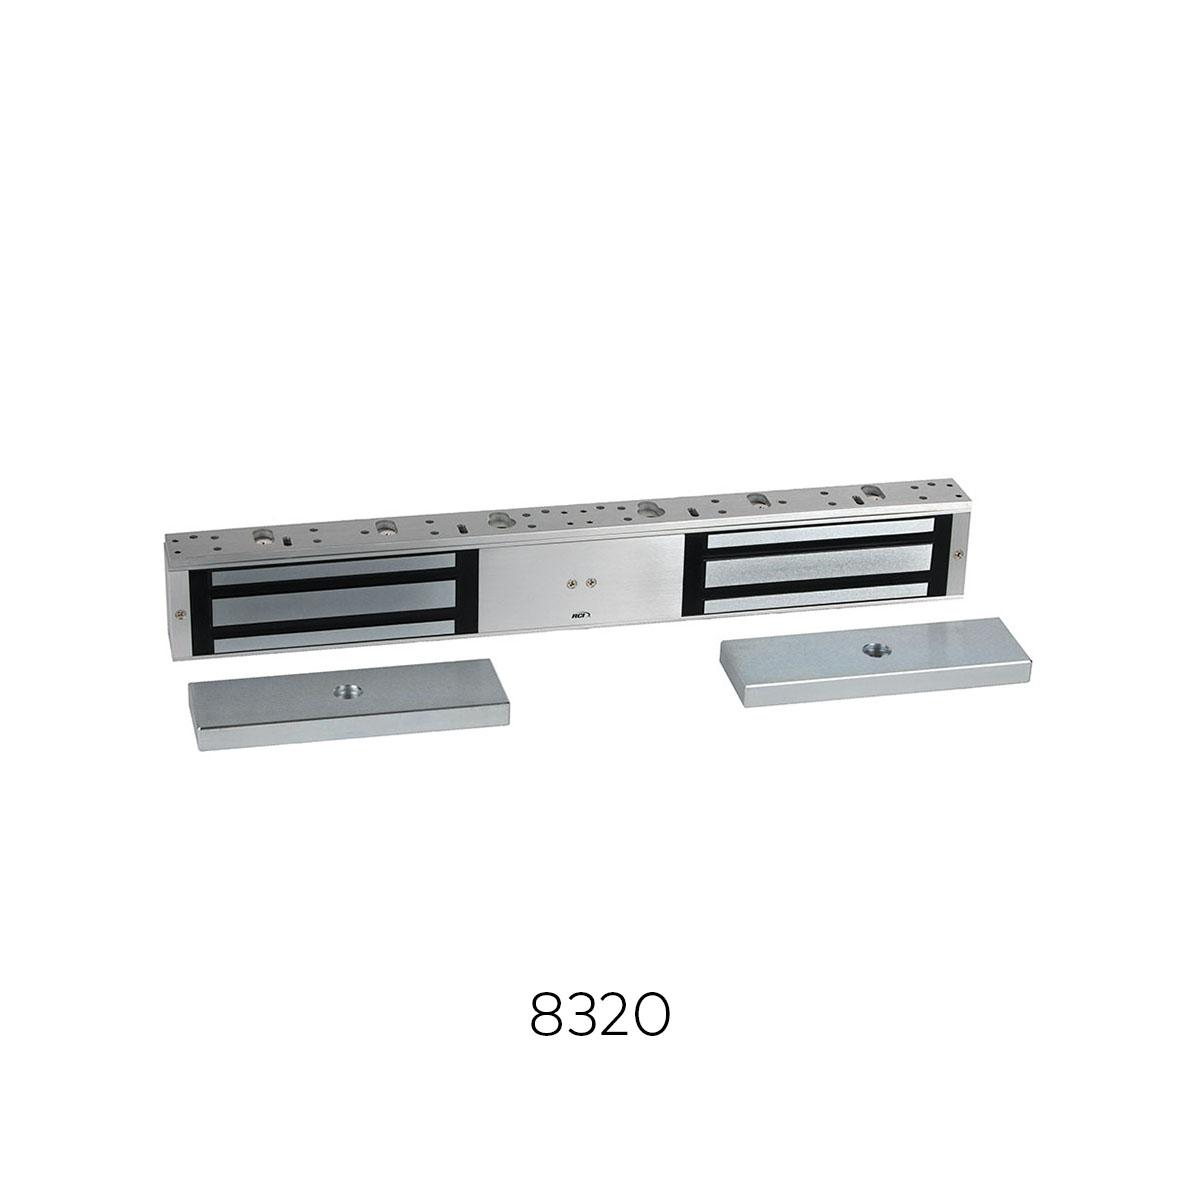 hight resolution of 8320 multimag electromagnetic locks rci ead